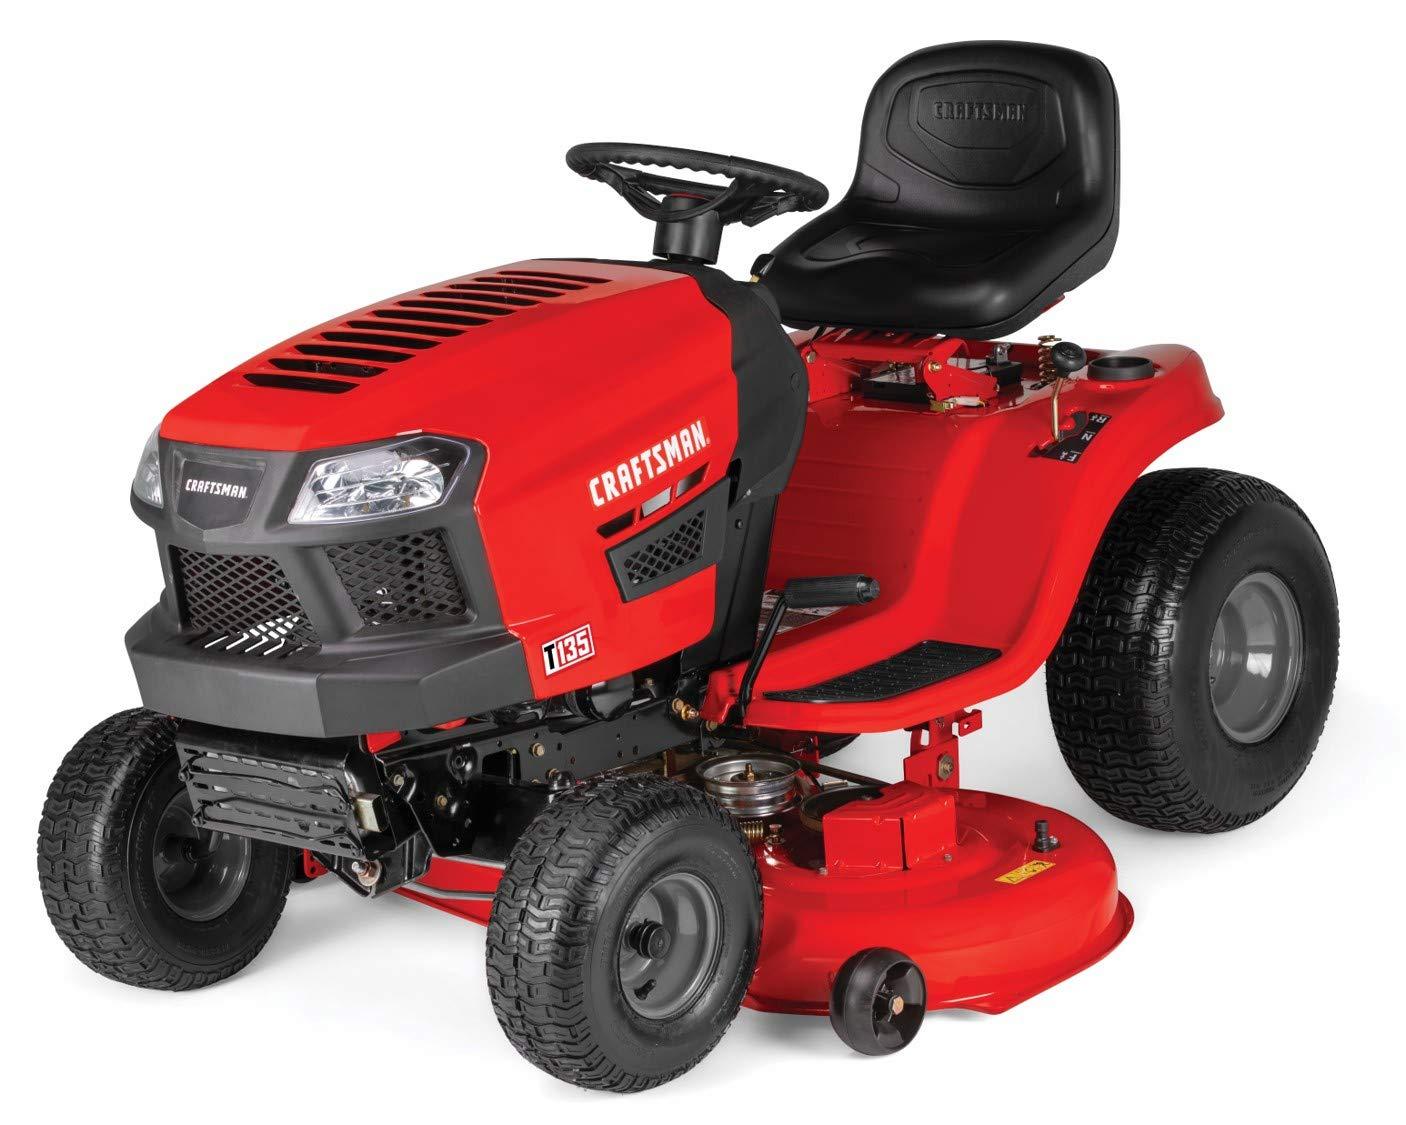 Craftsman T135 18.5 HP Briggs & Stratton 46-Inch Gas Powered Riding Lawn Mower